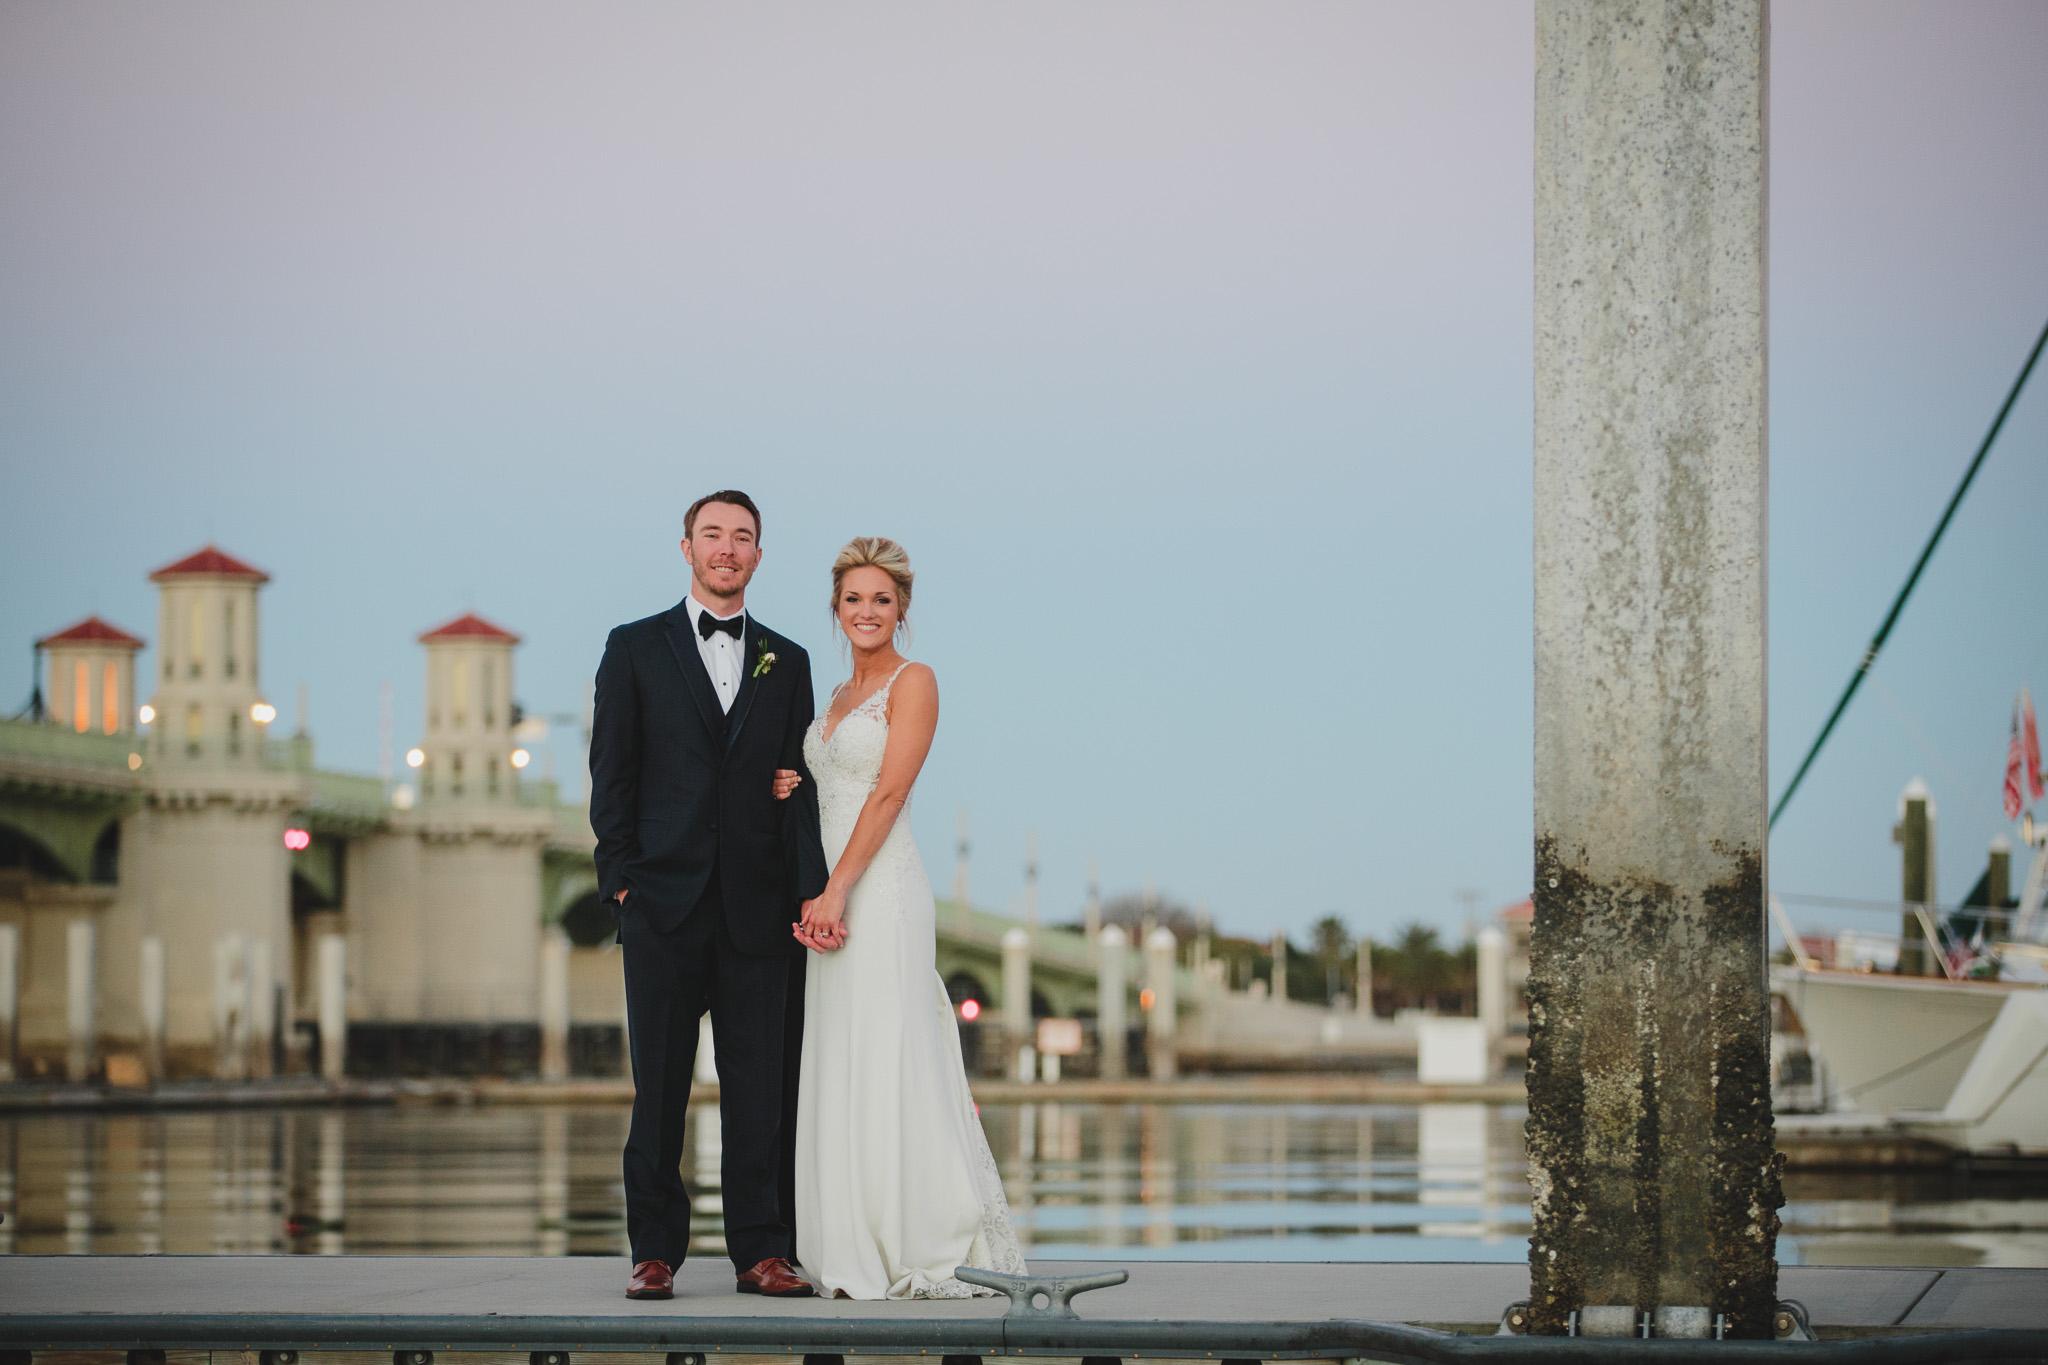 st-augustine-florida-wedding-venue-waterfront-views-white-room-bridge-of-lions